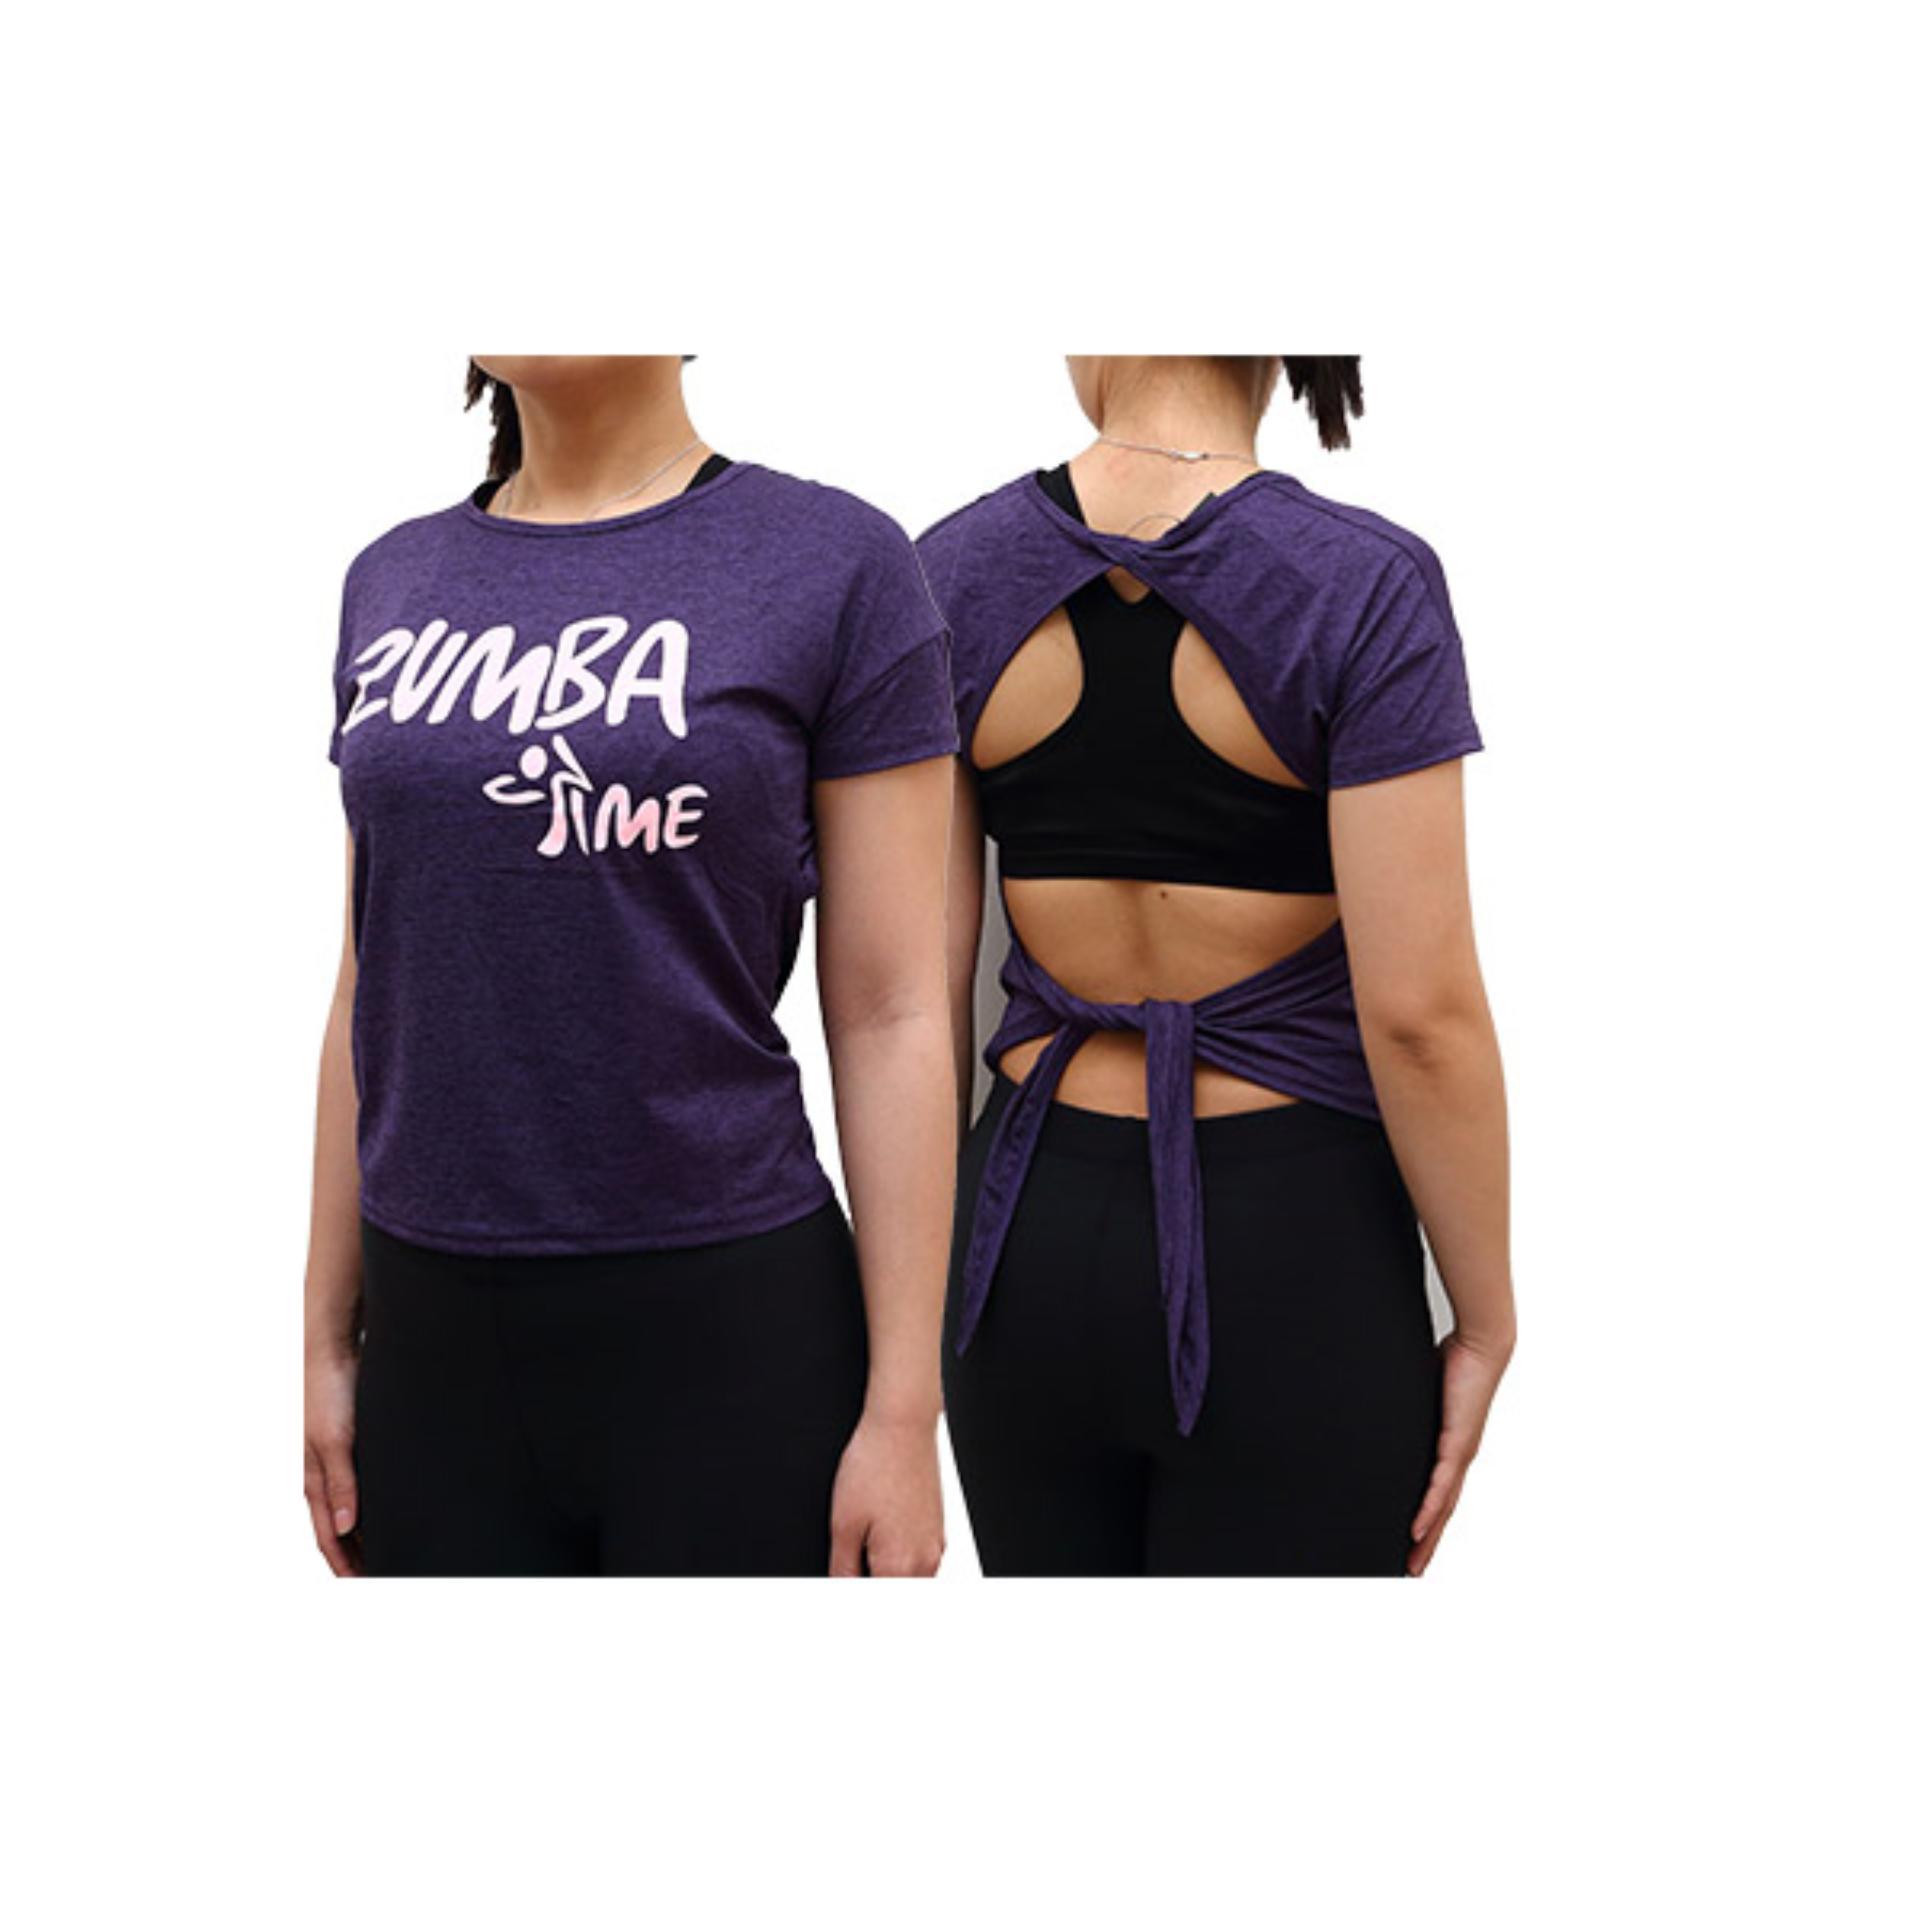 Online Murah Baju Senam Zumba Kaos Aerobik Fitness Gym 2016 Purple Aerobic